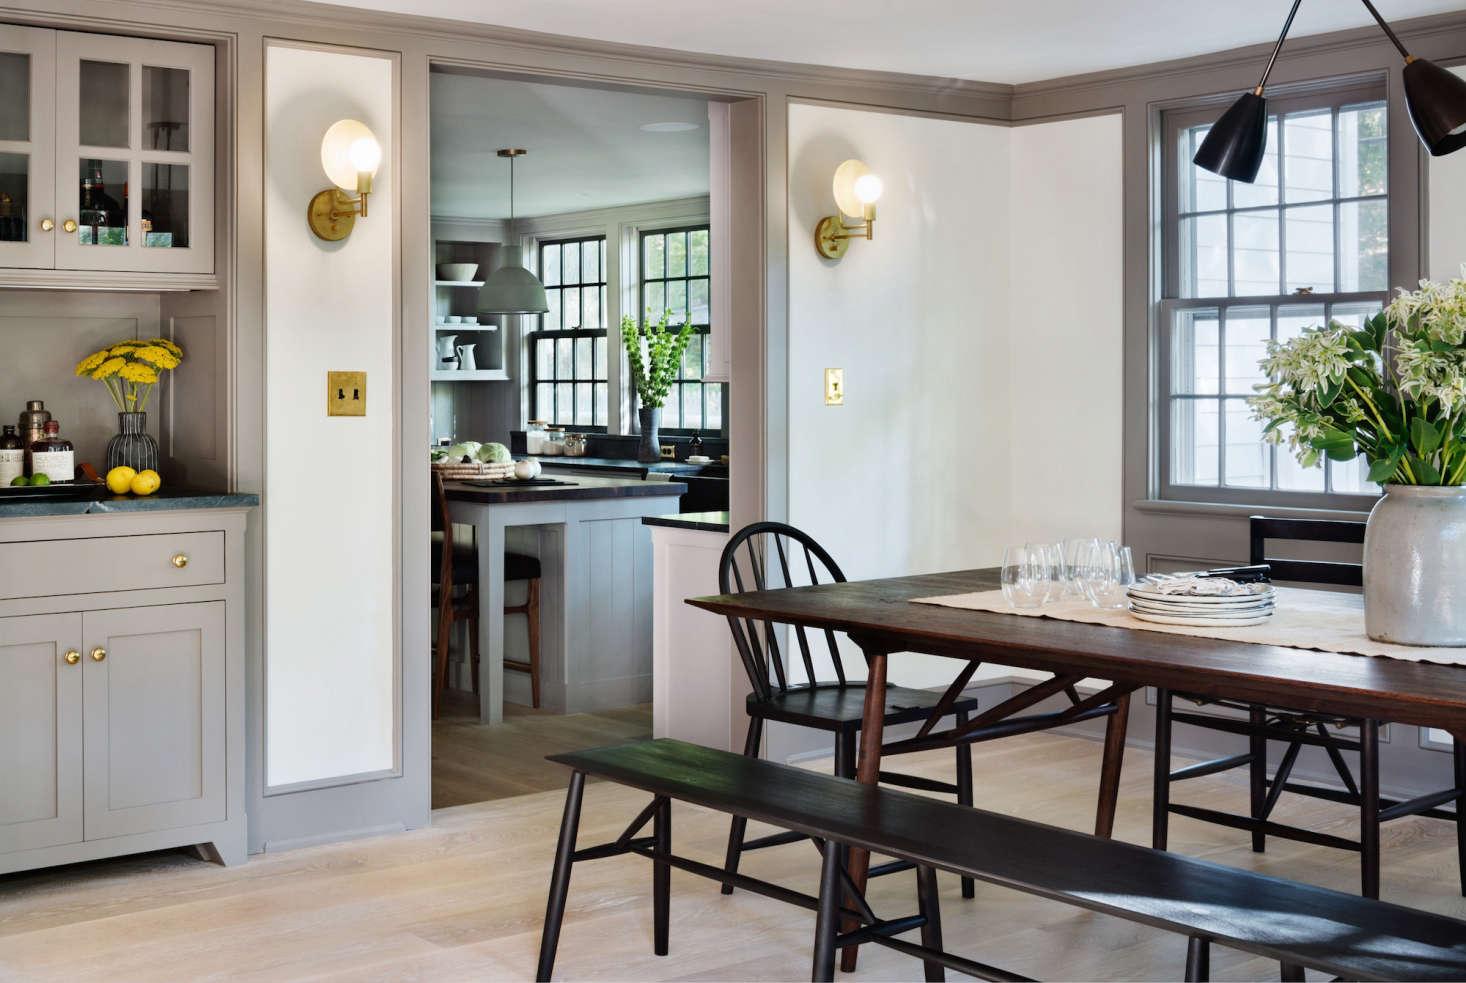 modern-farmhouse-renovation-dining-room-kitchen-brass-sconces-built-in-storage